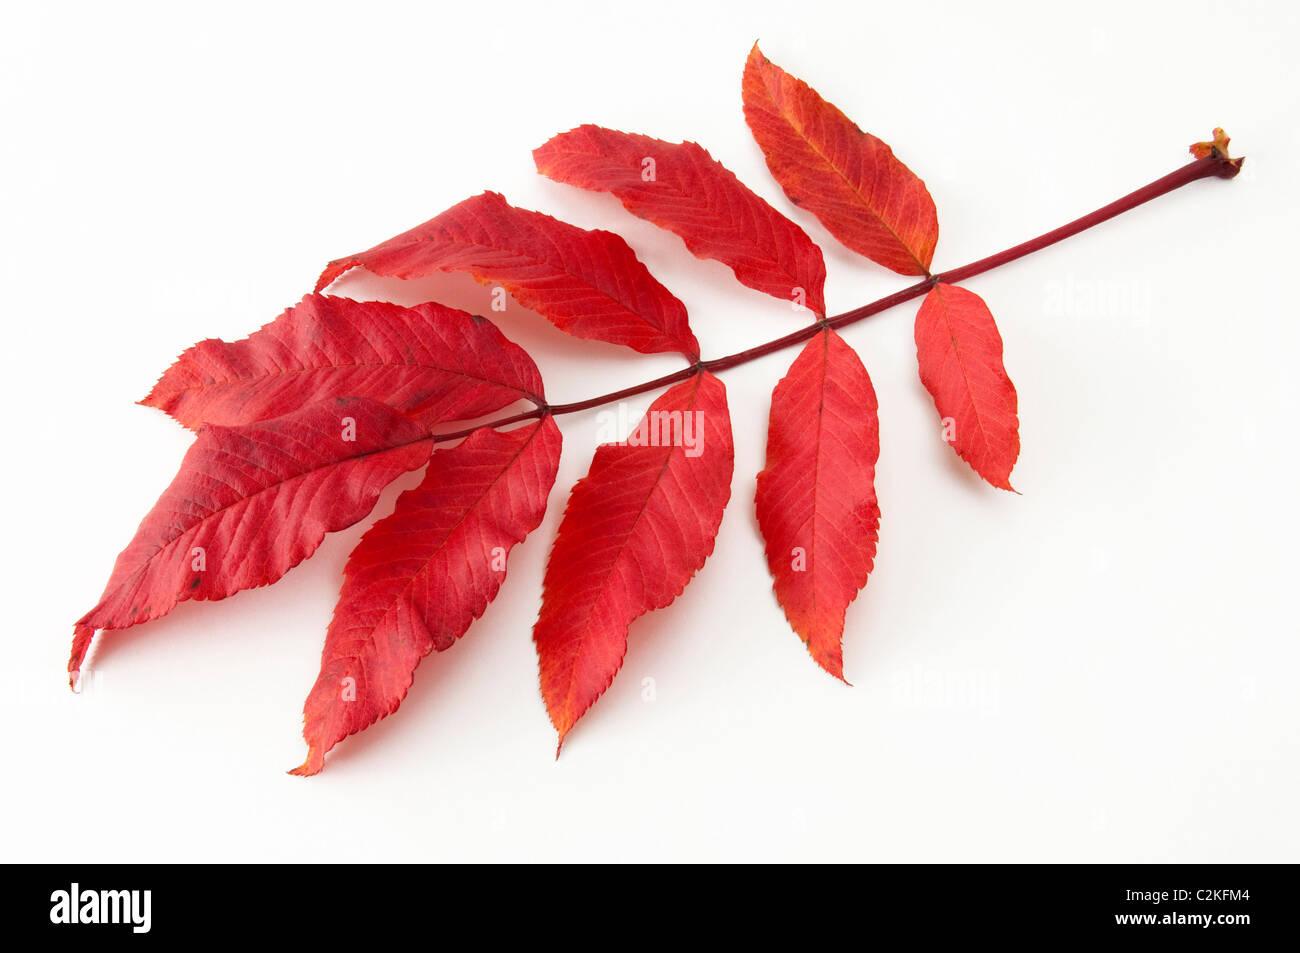 Mountain Ash, Rowan (Sorbus aucuparia), autumn leaf. Studio picture against a white background. - Stock Image